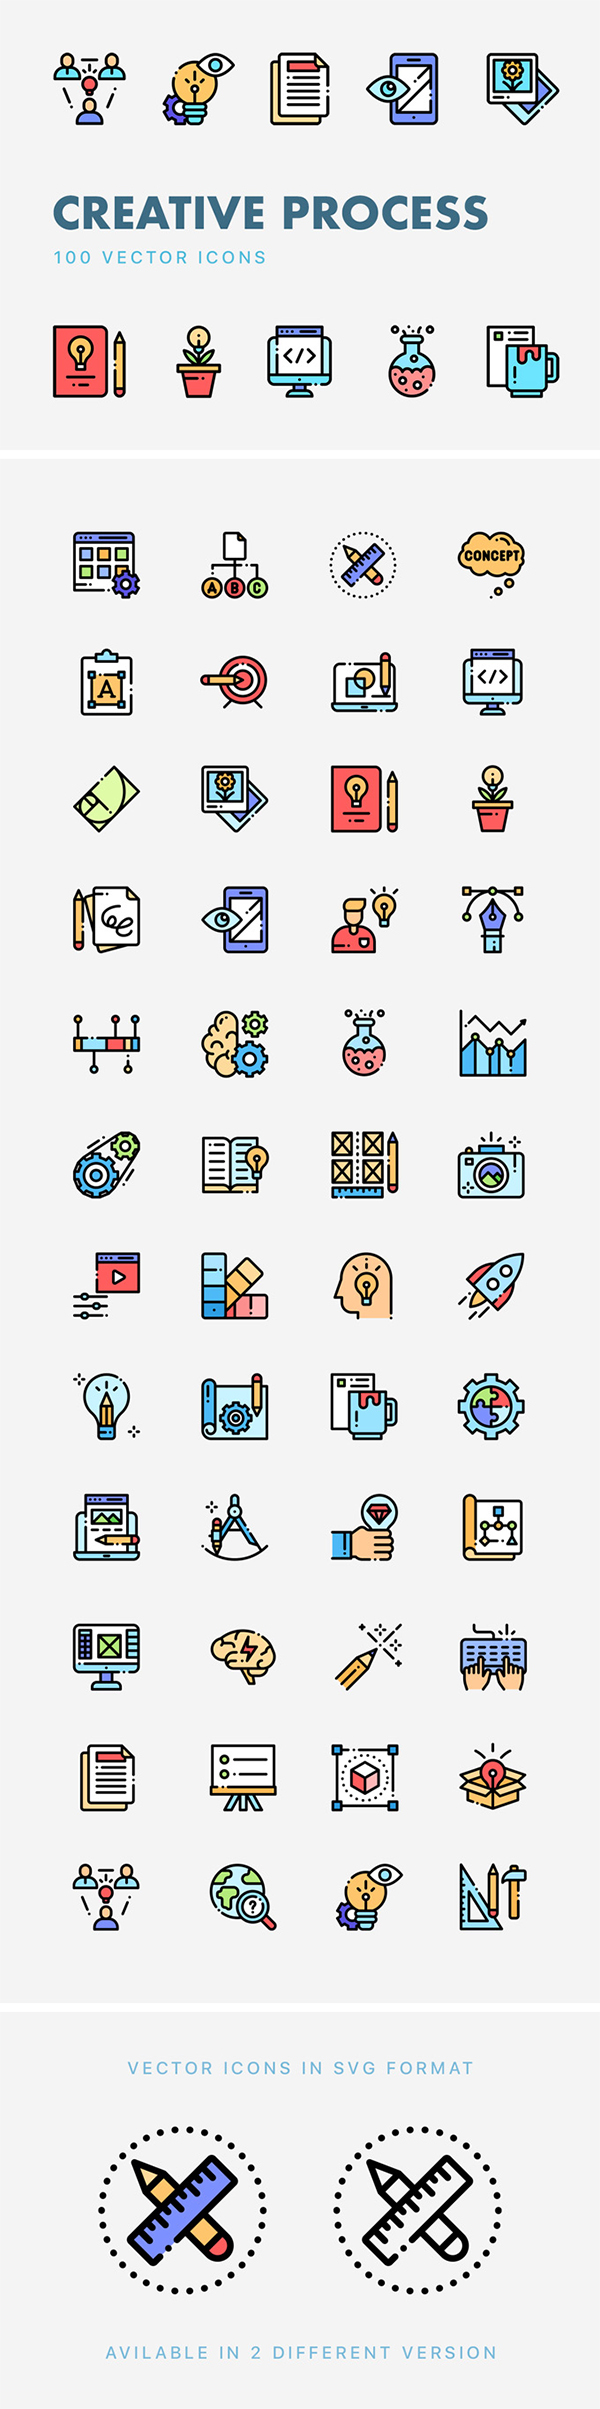 Creative Process Vector Icons